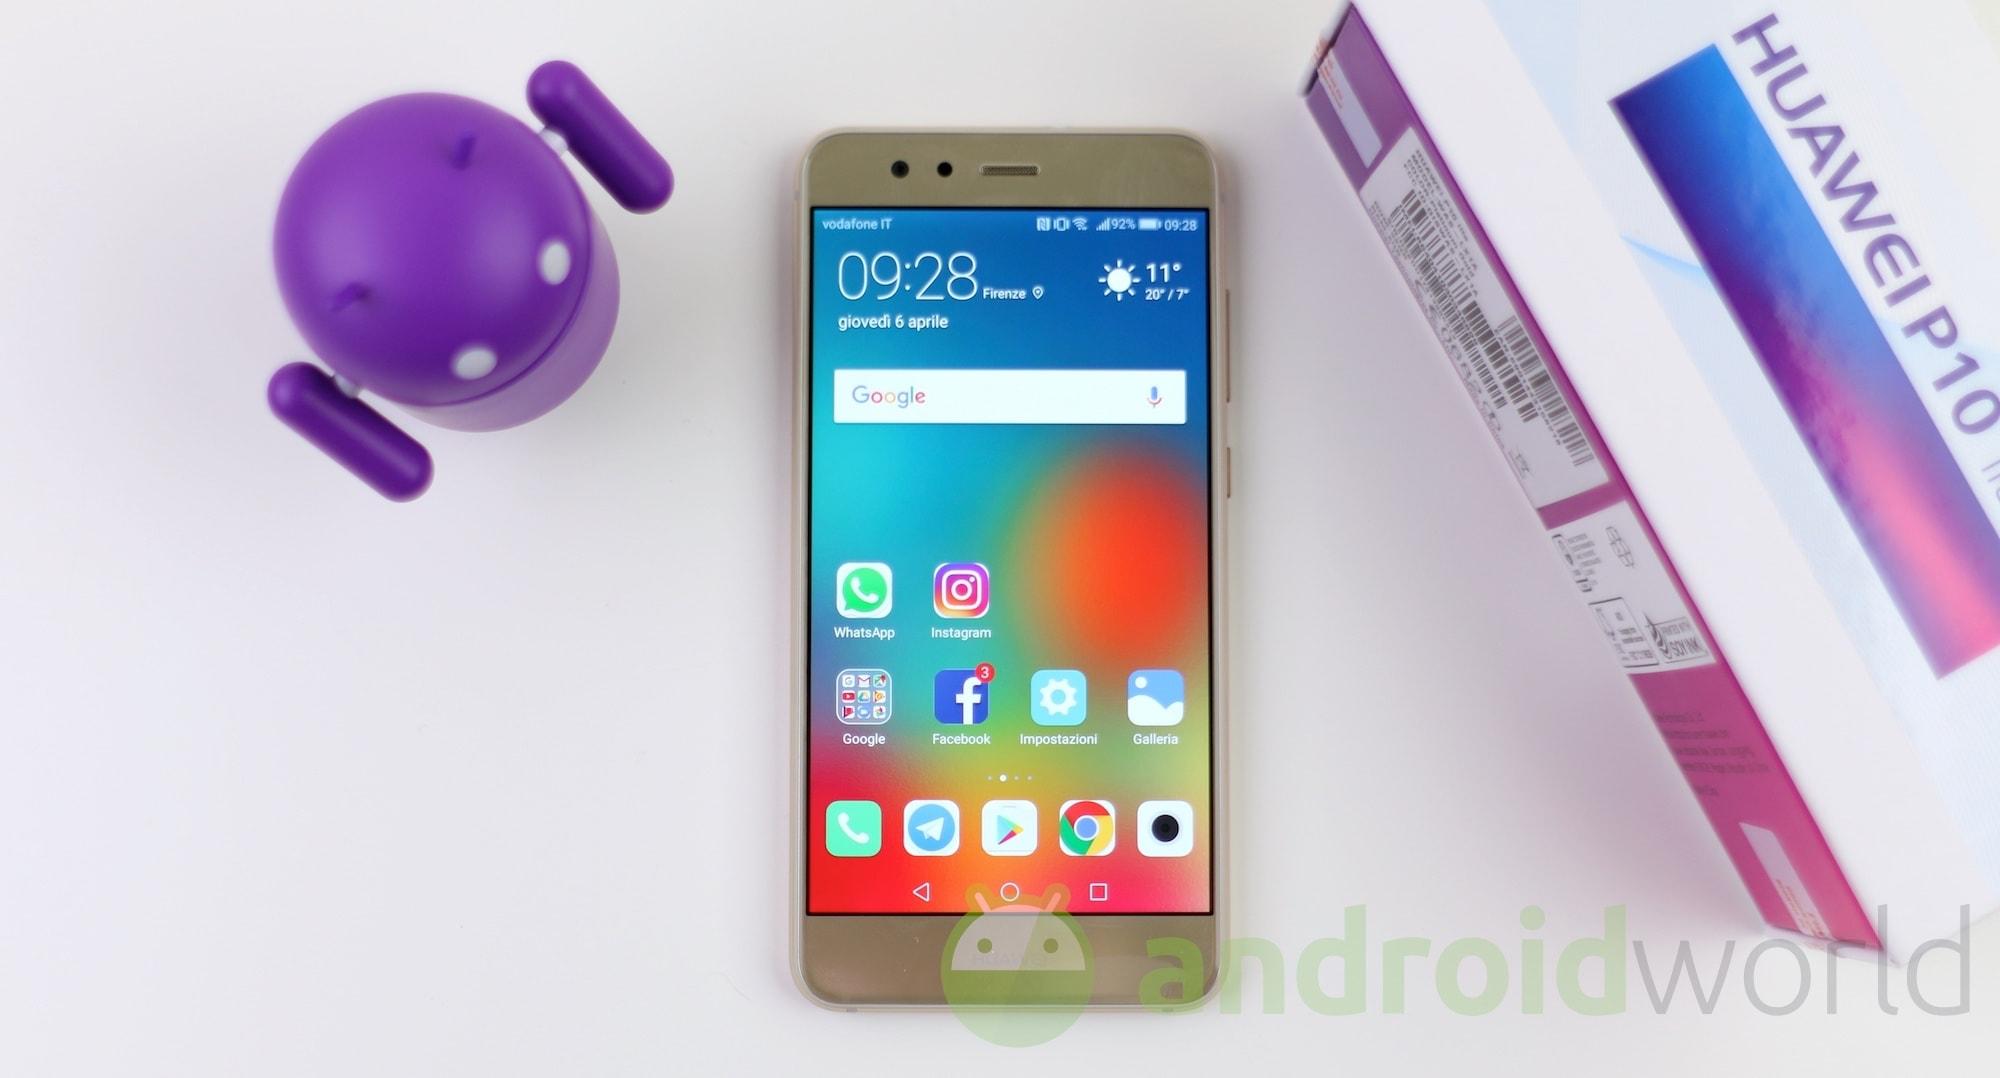 Huawei P10 Lite La Recensione Foto E Video Foto 1 Di 5